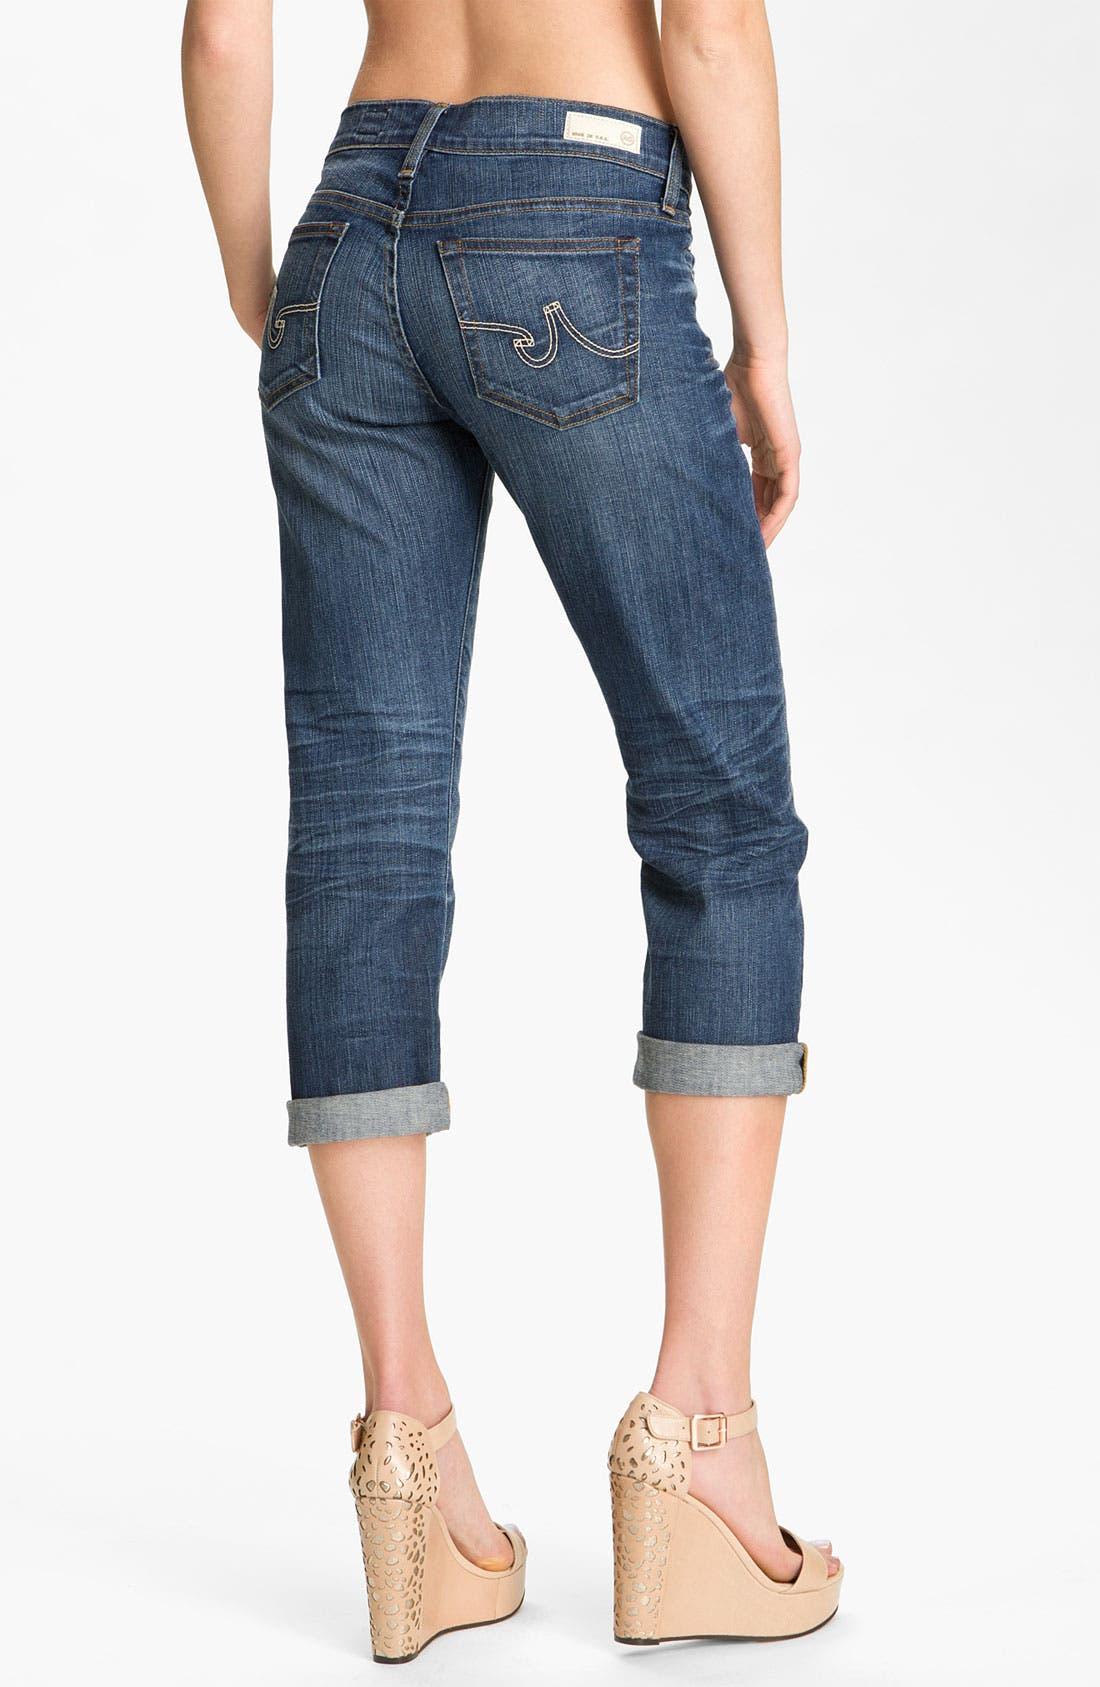 Alternate Image 2  - AG Jeans 'Tomboy' Crop Stretch Jeans (10 Year Vintage)